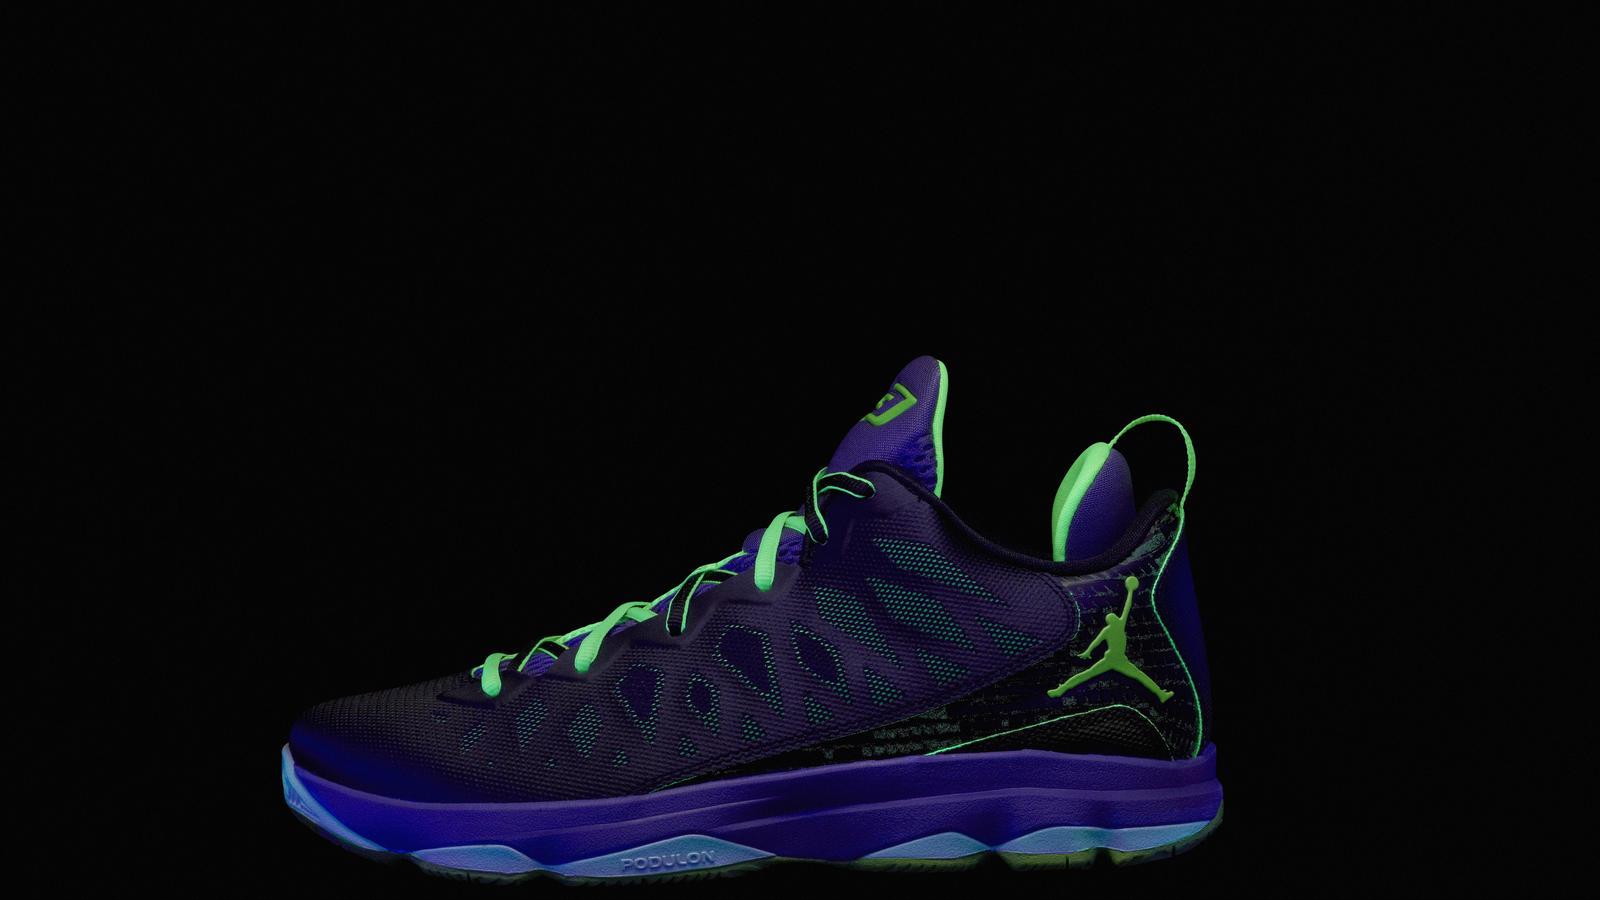 Jordan_2013_AllStar_Ftwr_CP3_LAT_Glow_blk